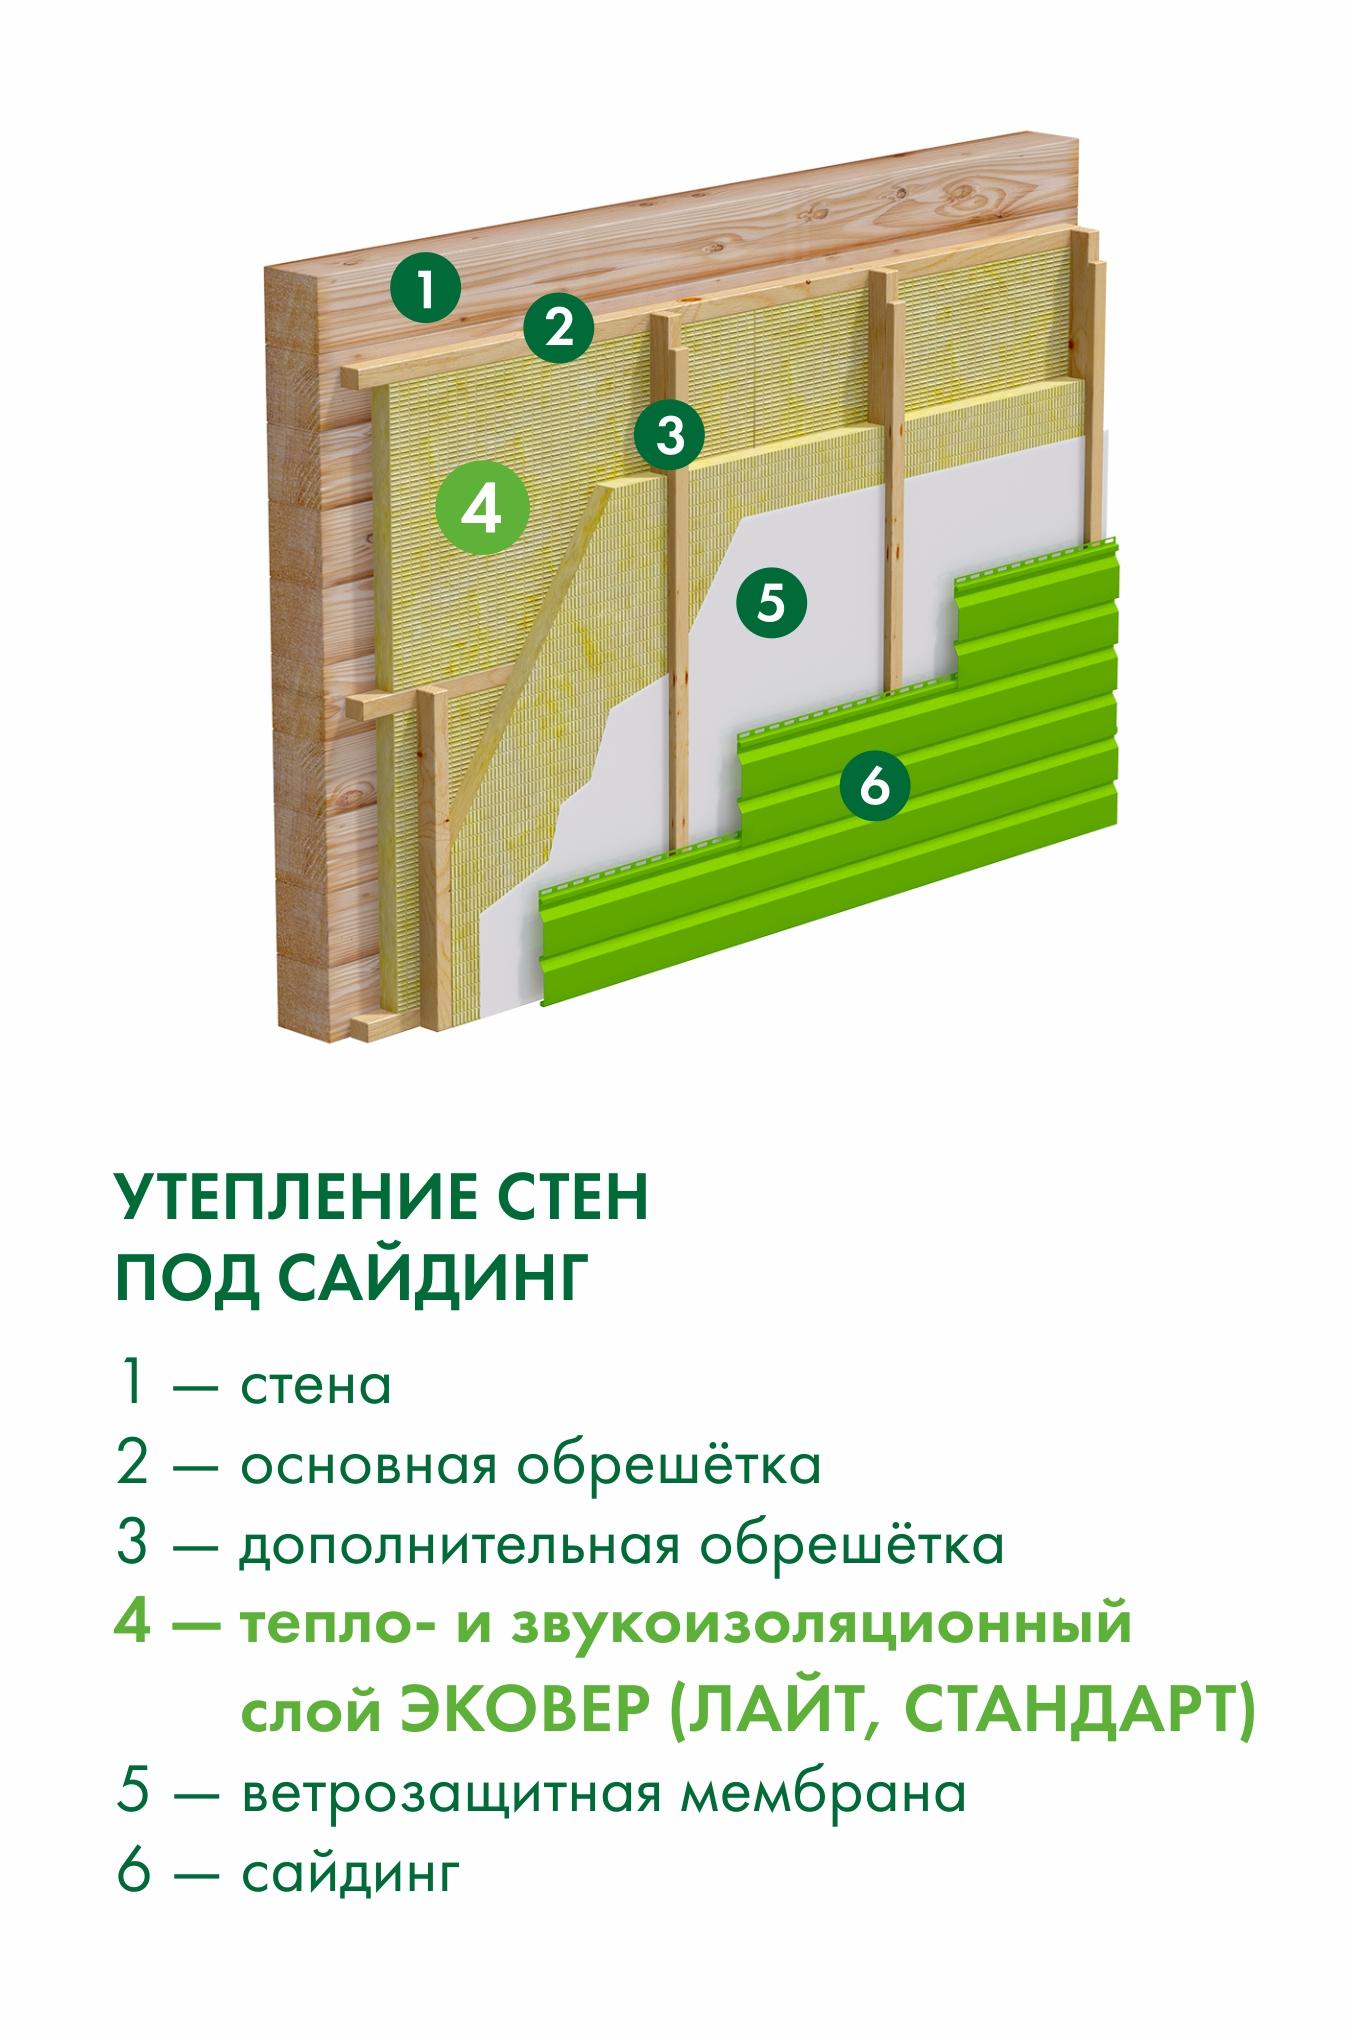 Тепло- и звукоизоляция стен под сайдинг